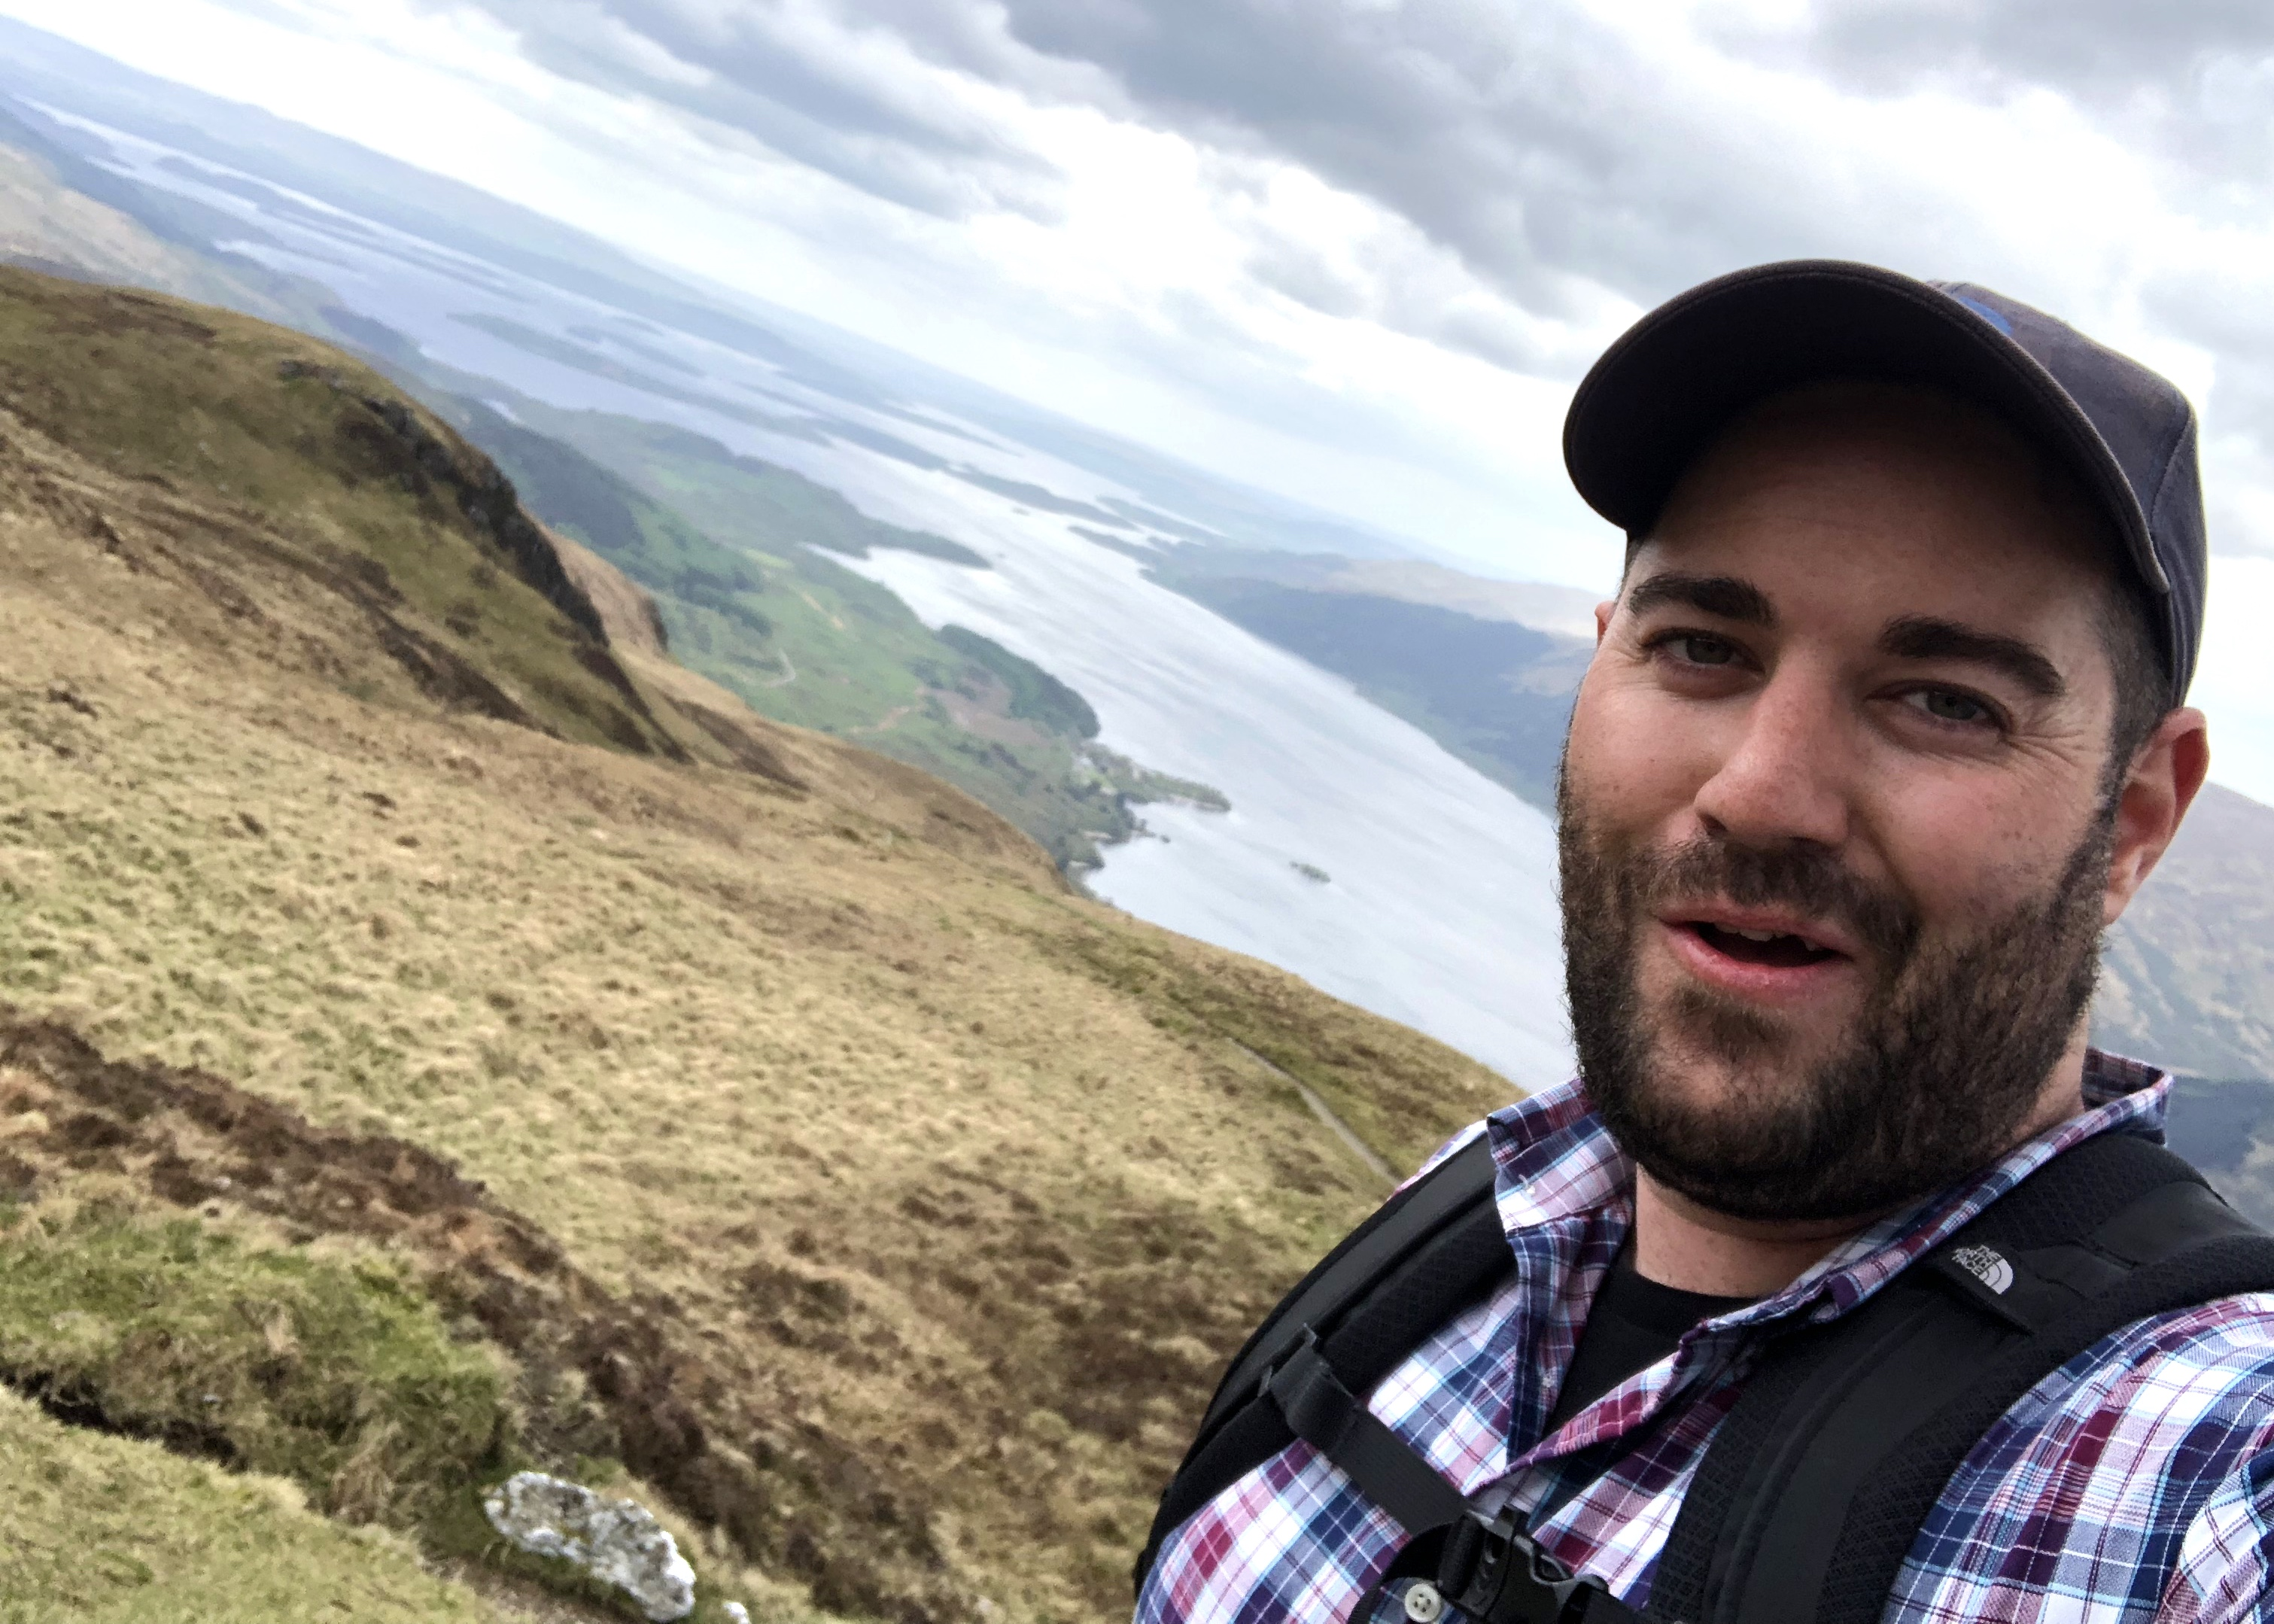 Loch lomond, Scotland 31